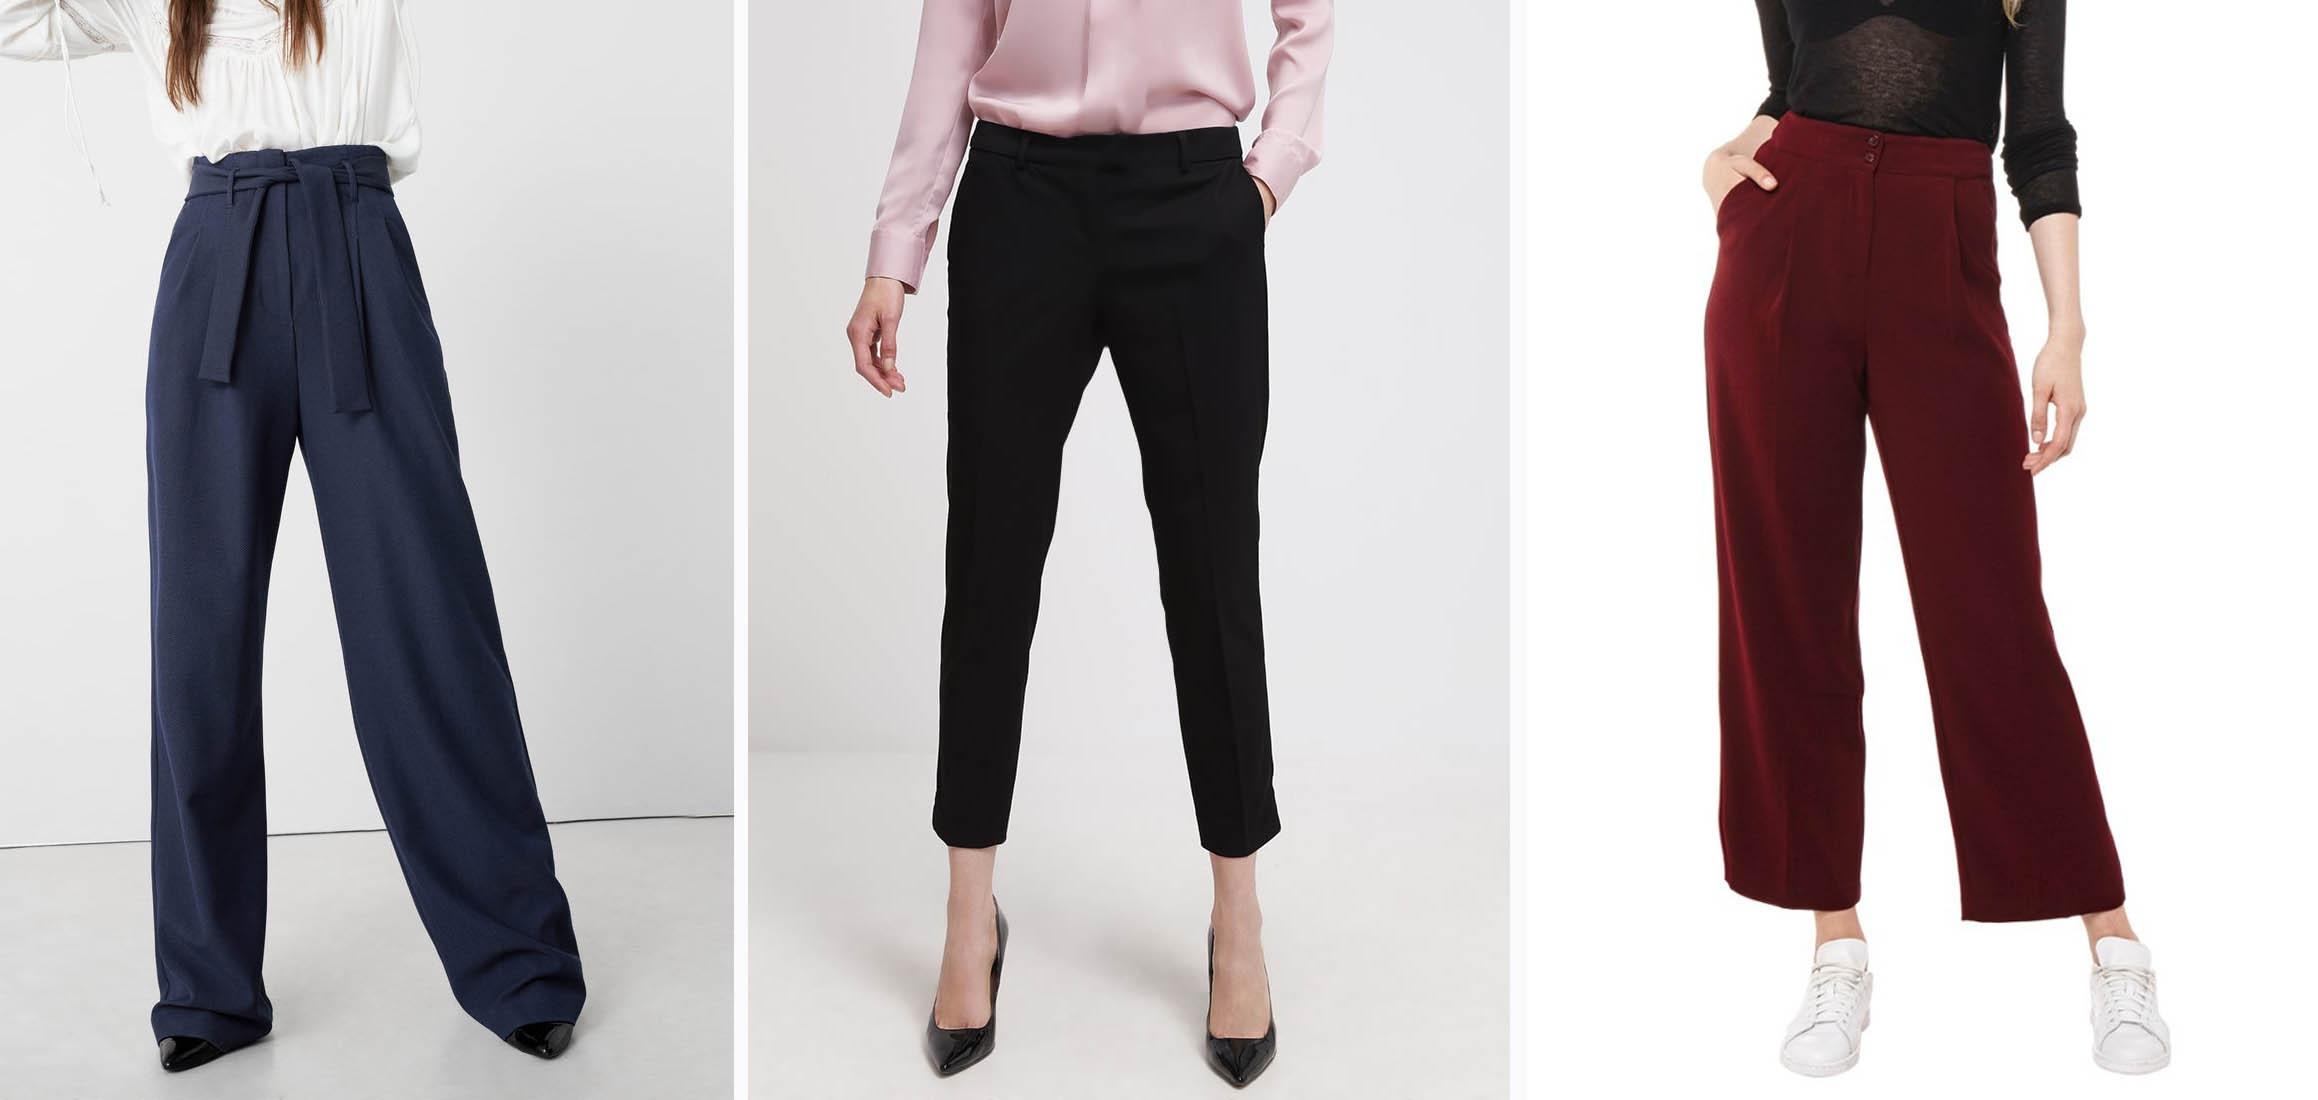 Shoppen: Altijd classy in één van deze 19 pantalons